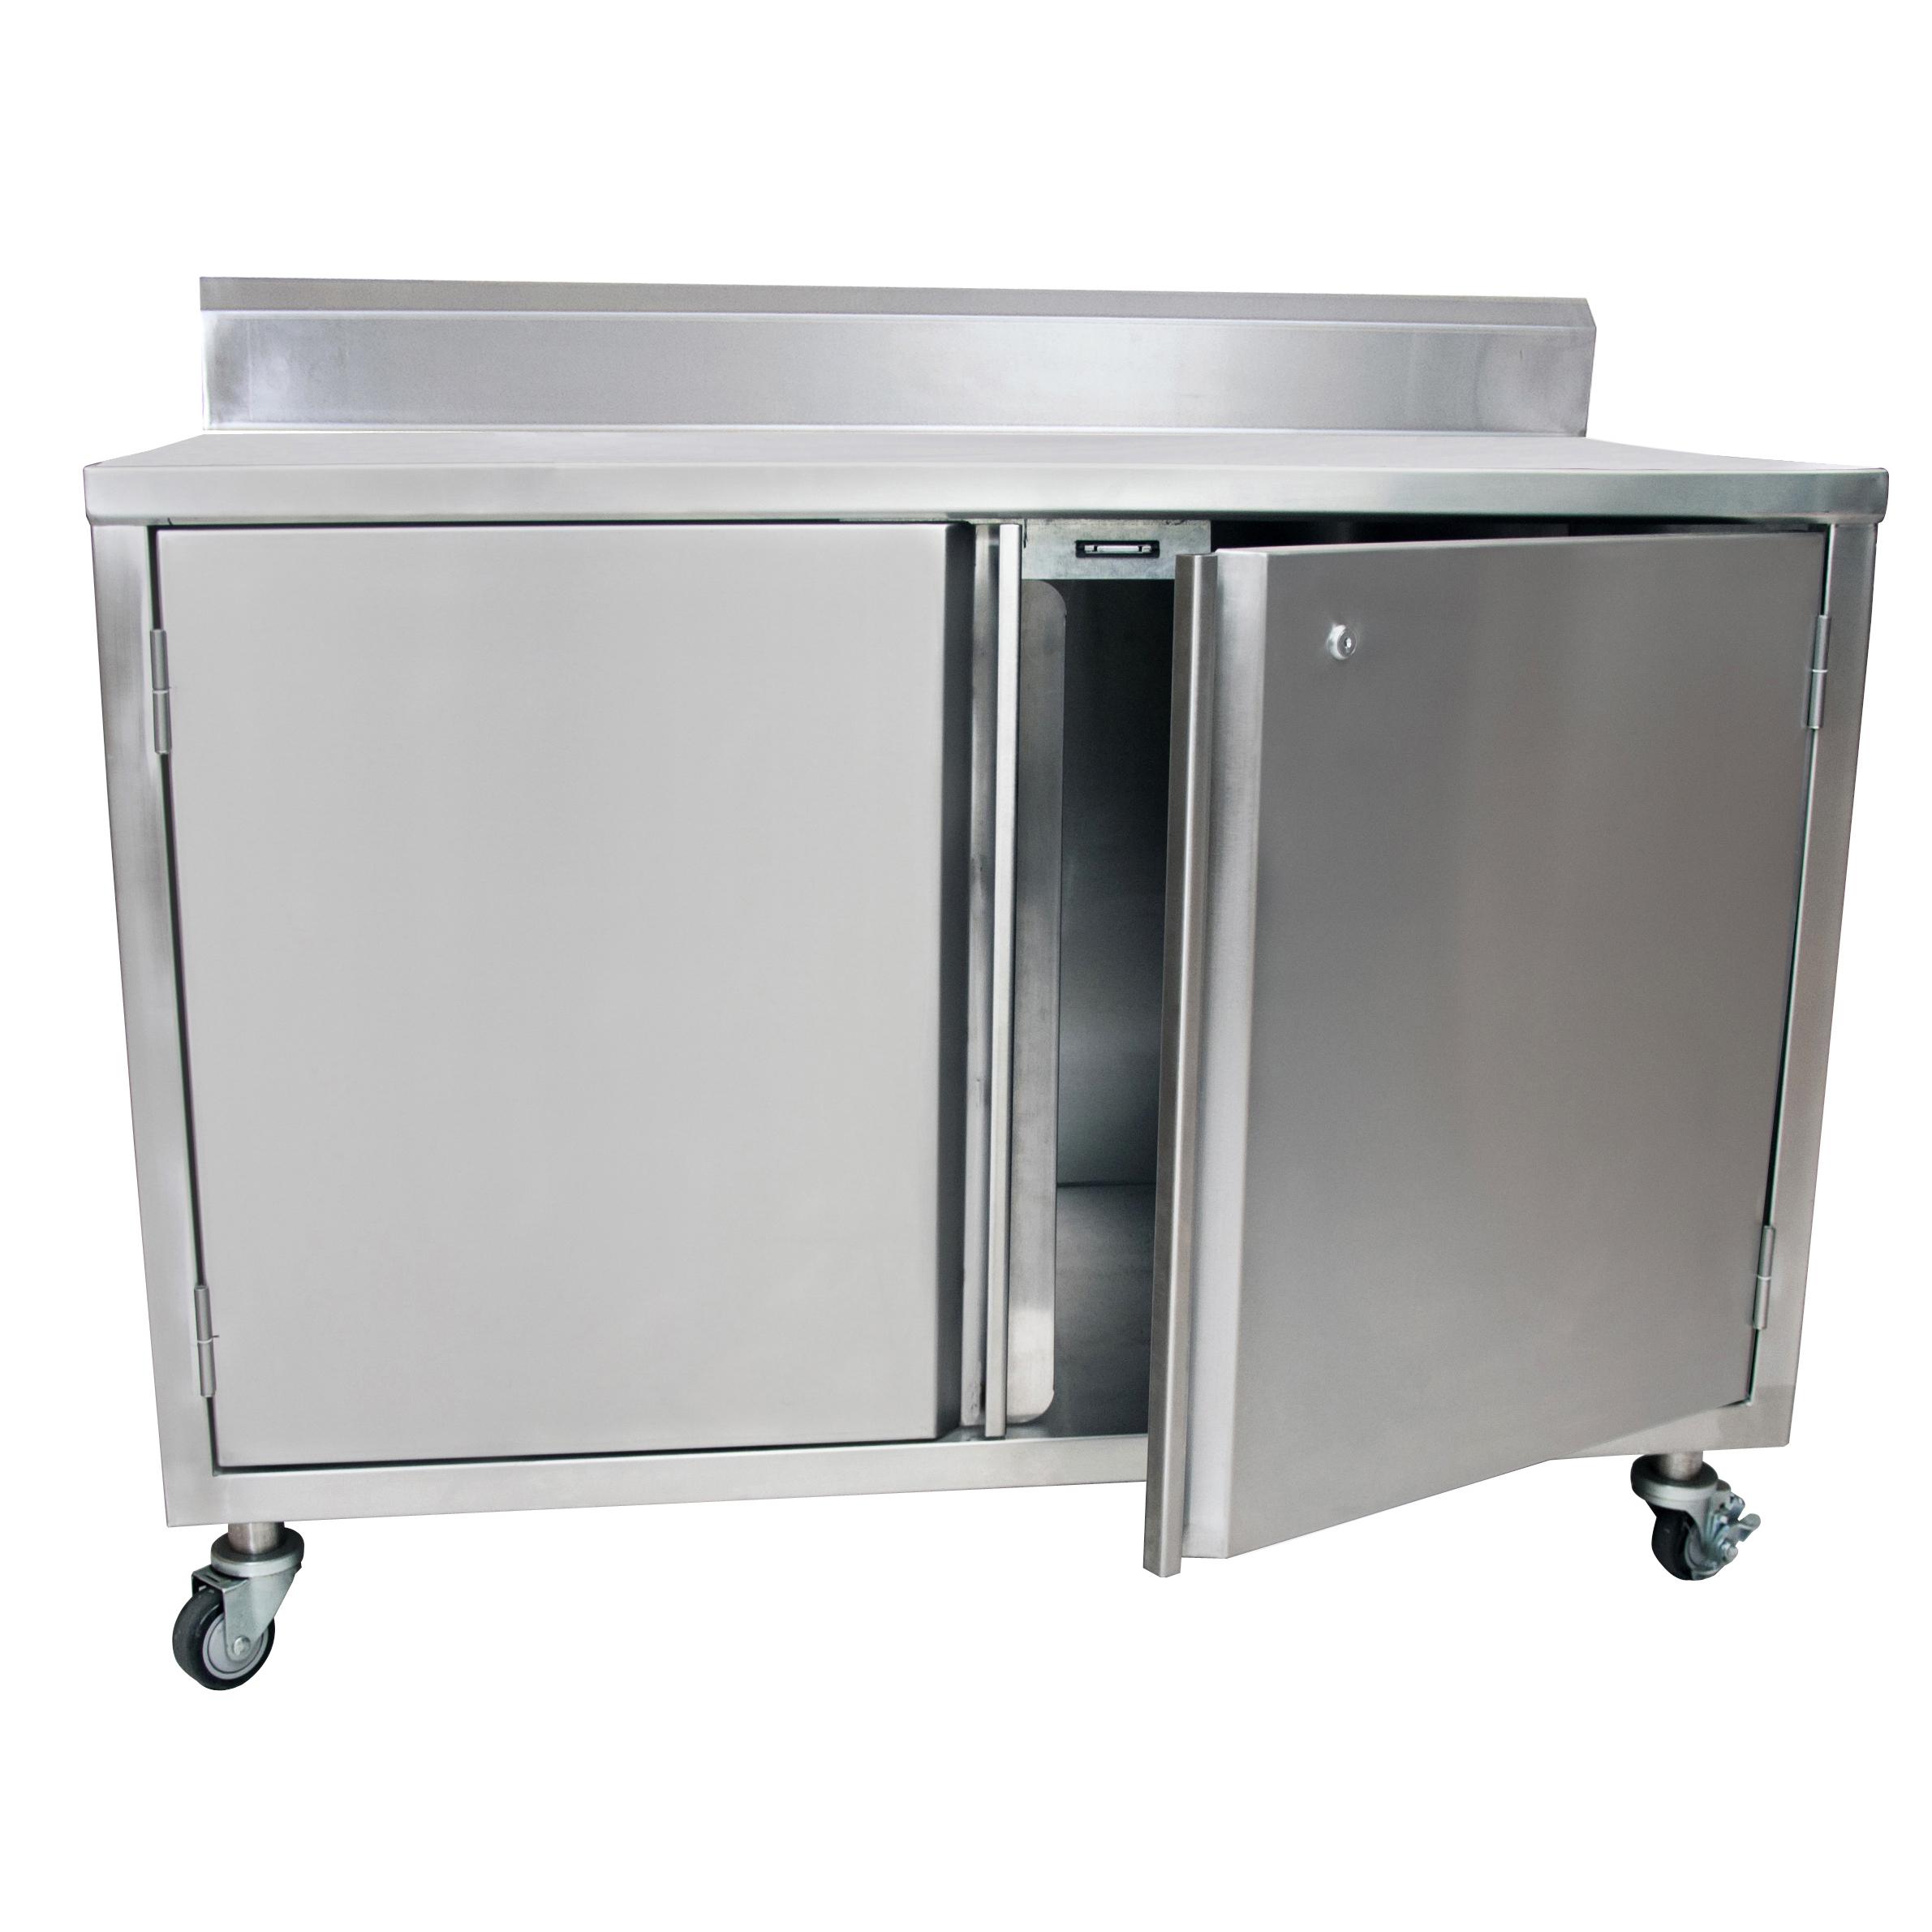 BK Resources BKDCR5-3048HL work table, cabinet base hinged doors